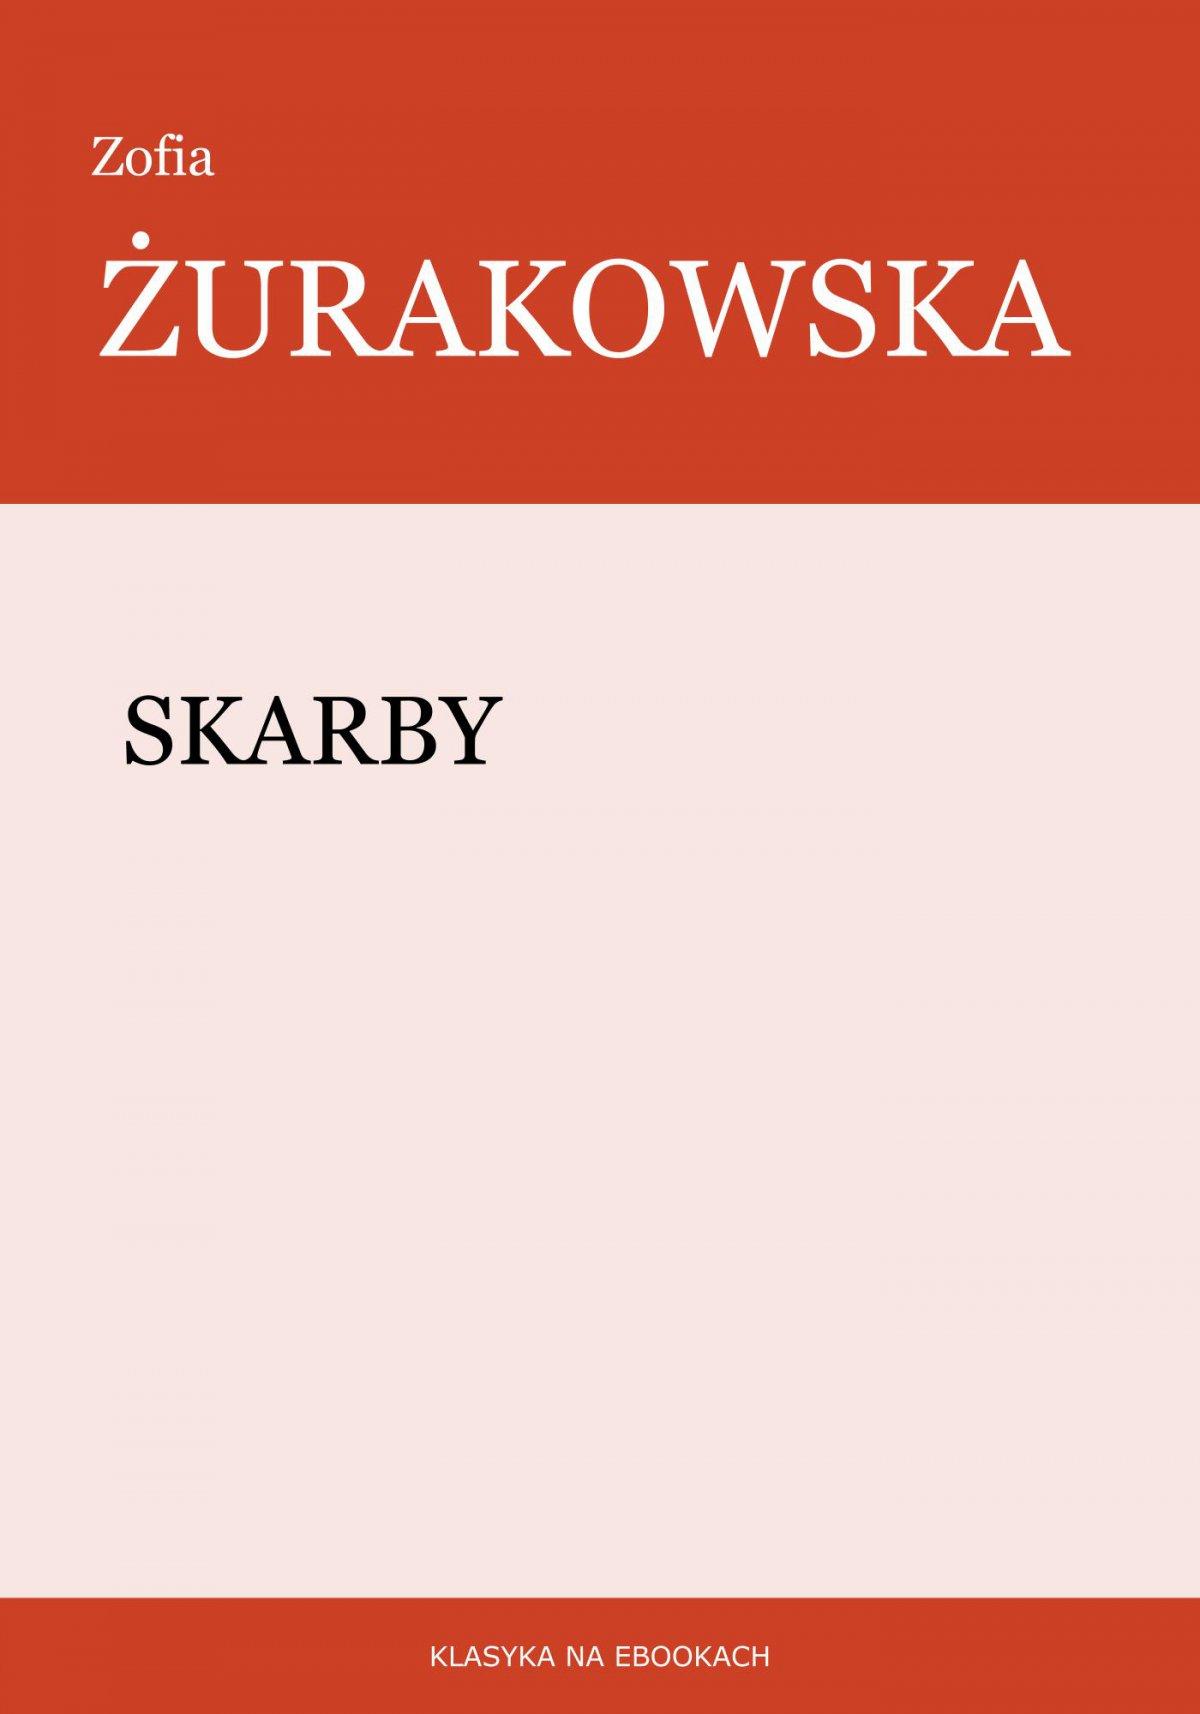 Skarby - Ebook (Książka na Kindle) do pobrania w formacie MOBI